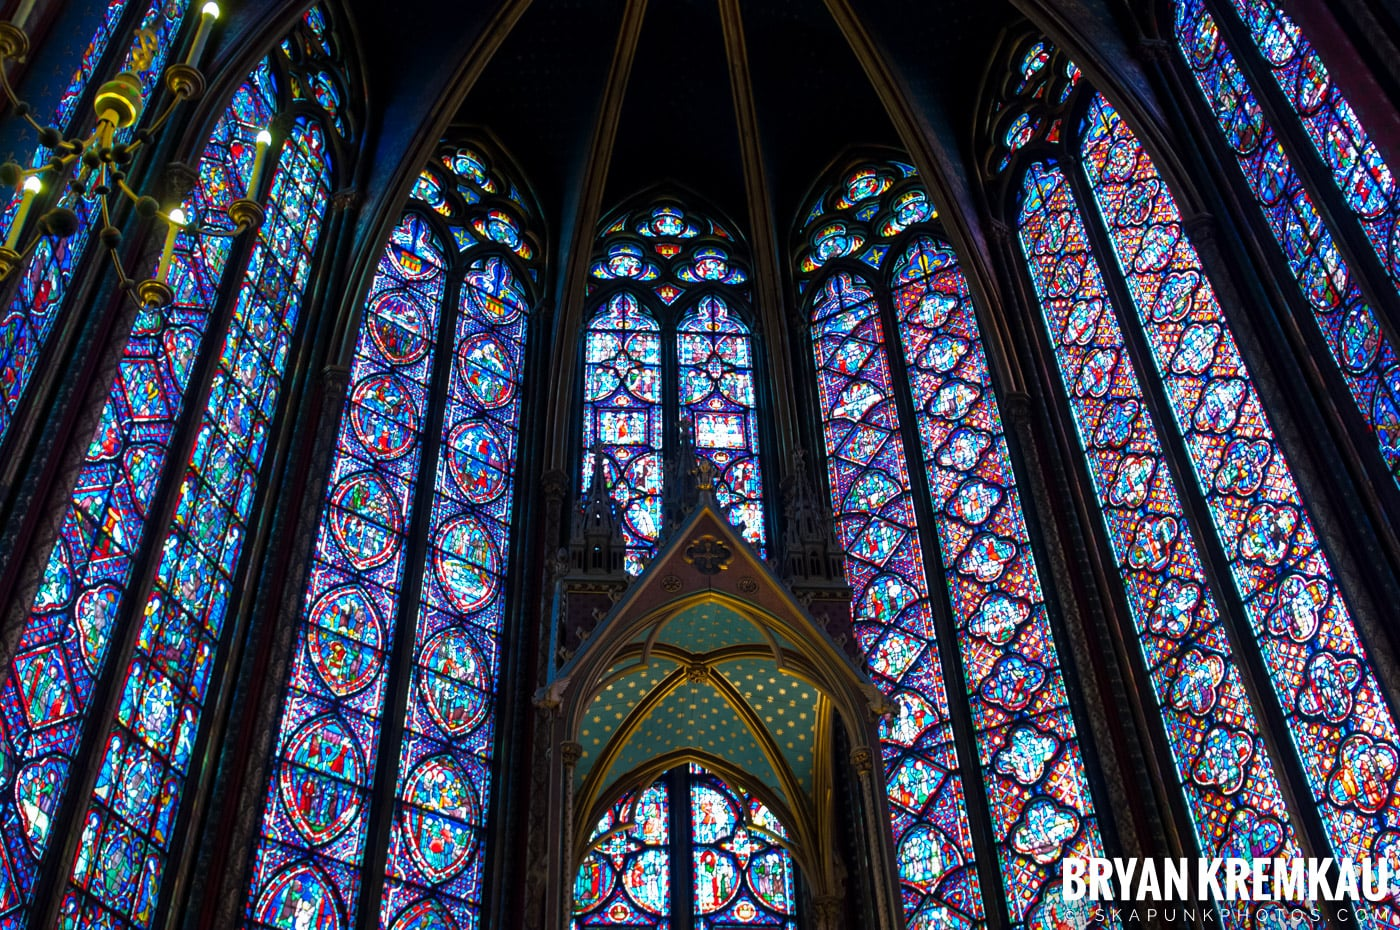 Paris, France Honeymoon - Day 5 - 7.22.11 (40)